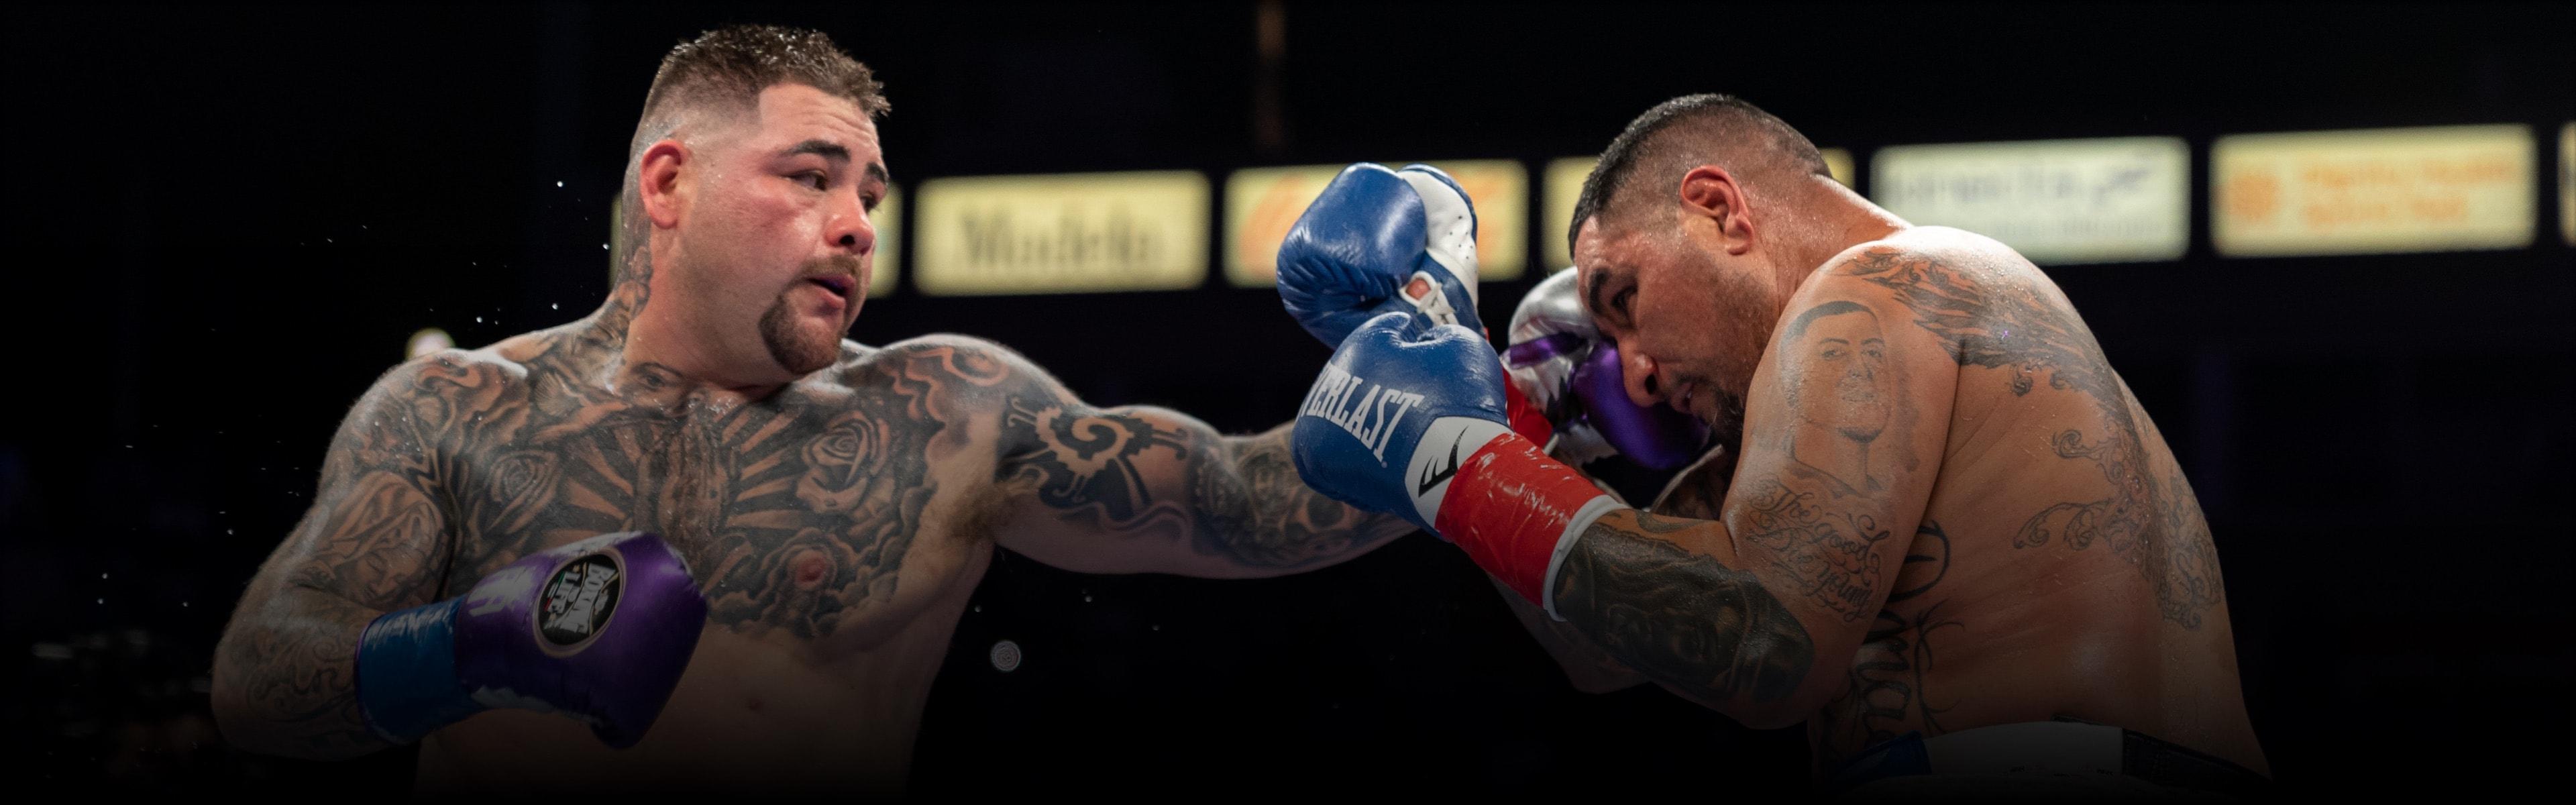 Andy Ruiz vs Chris Arreola to headline May 1 Fight Night